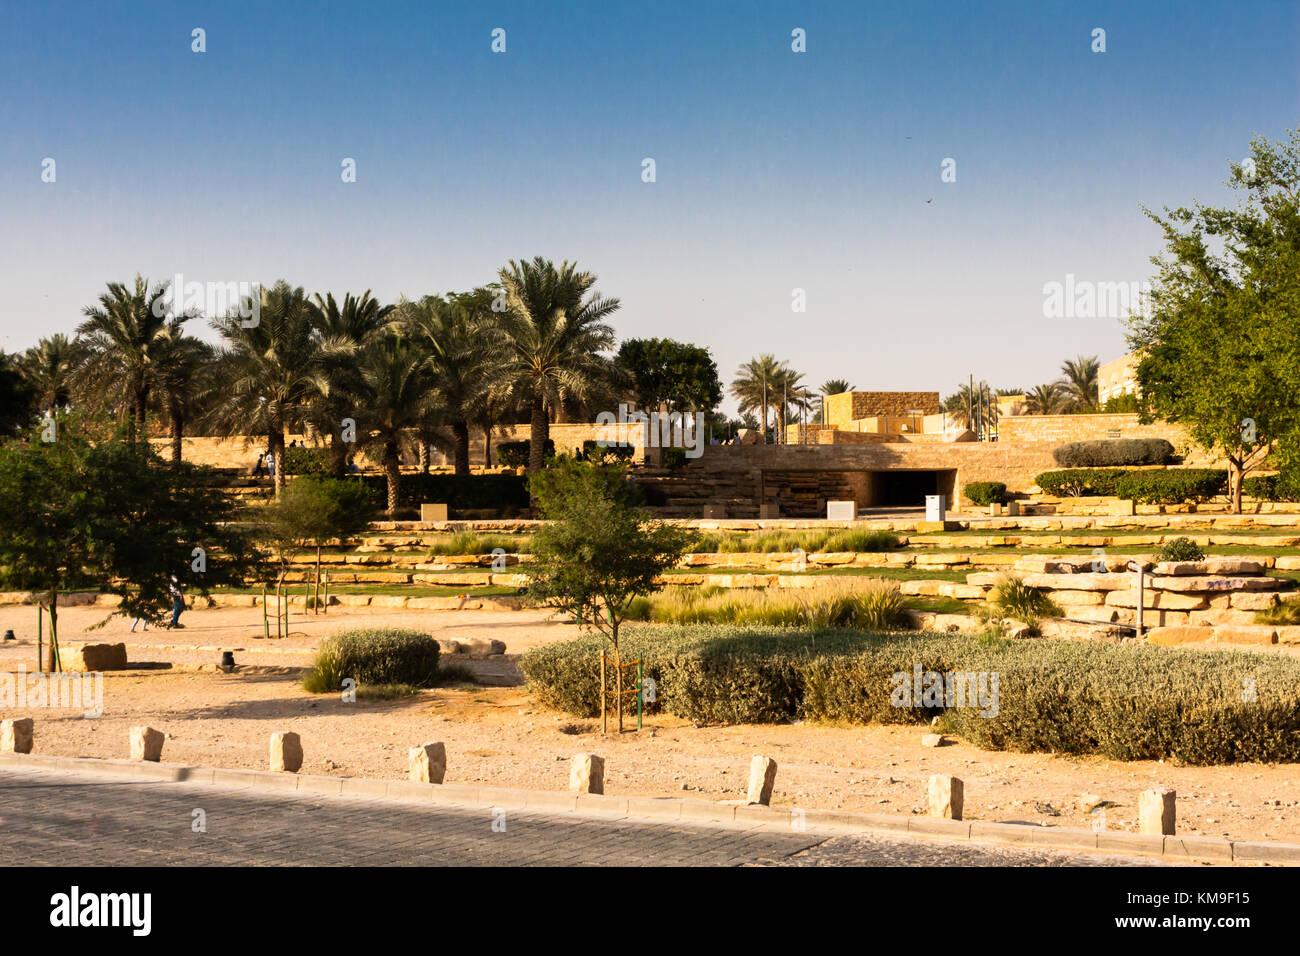 Parco di Diriyah, Riyadh, Arabia Saudita Immagini Stock